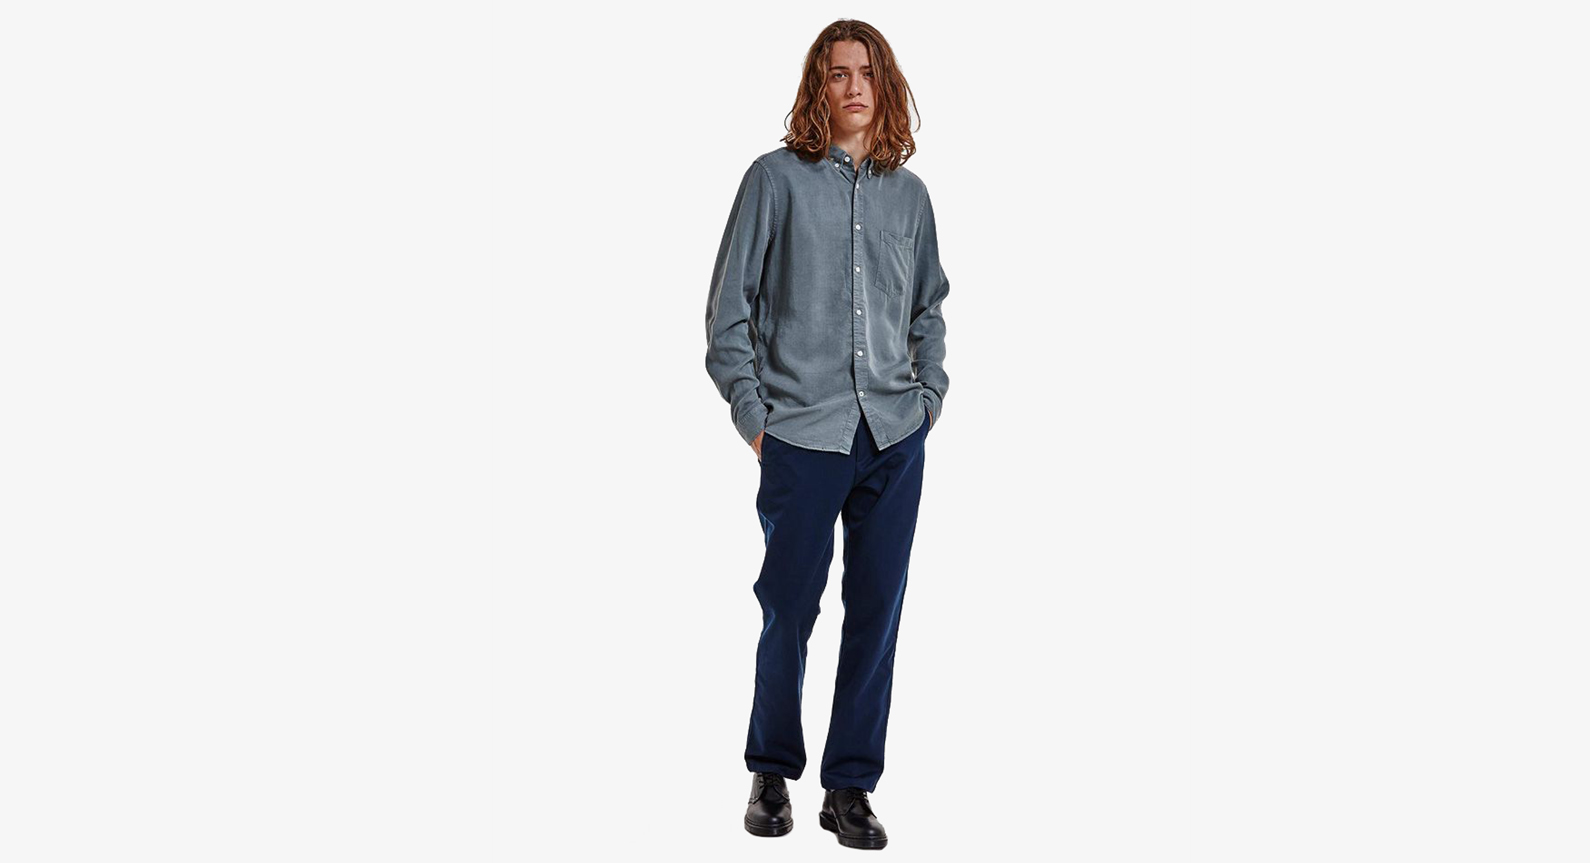 Top 5 Alternatives to Men's Jeans